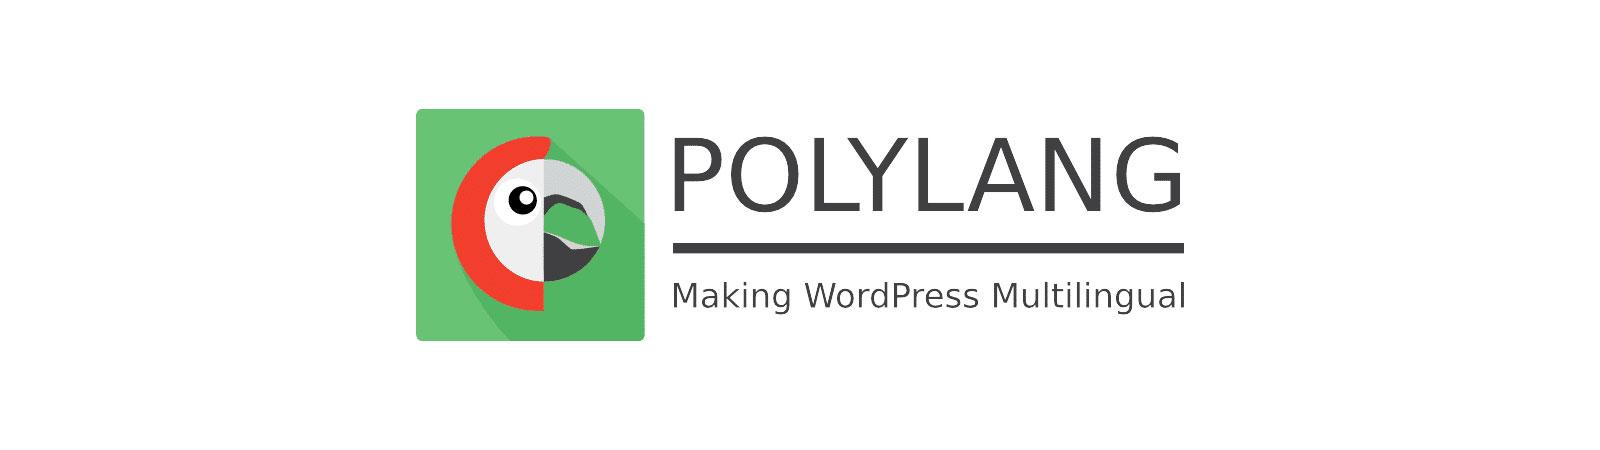 I migliori plugin multilingue per WordPress : Polylang